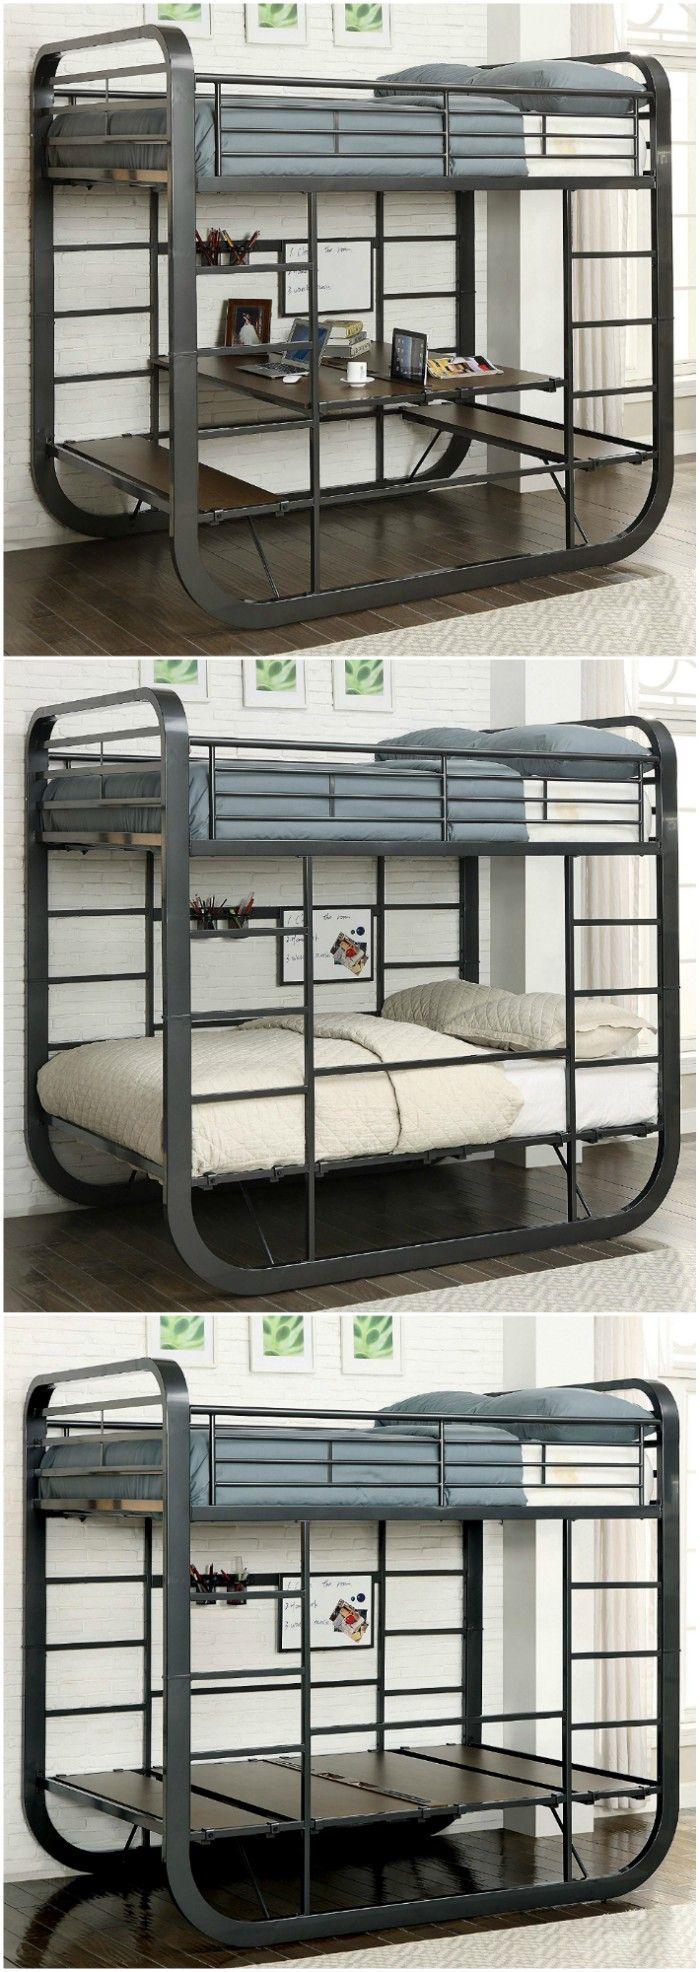 Ten Great Bunk And Loft Beds For Kids Living In A Shoebox Kid Beds Metal Bunk Beds Kids Bunk Beds